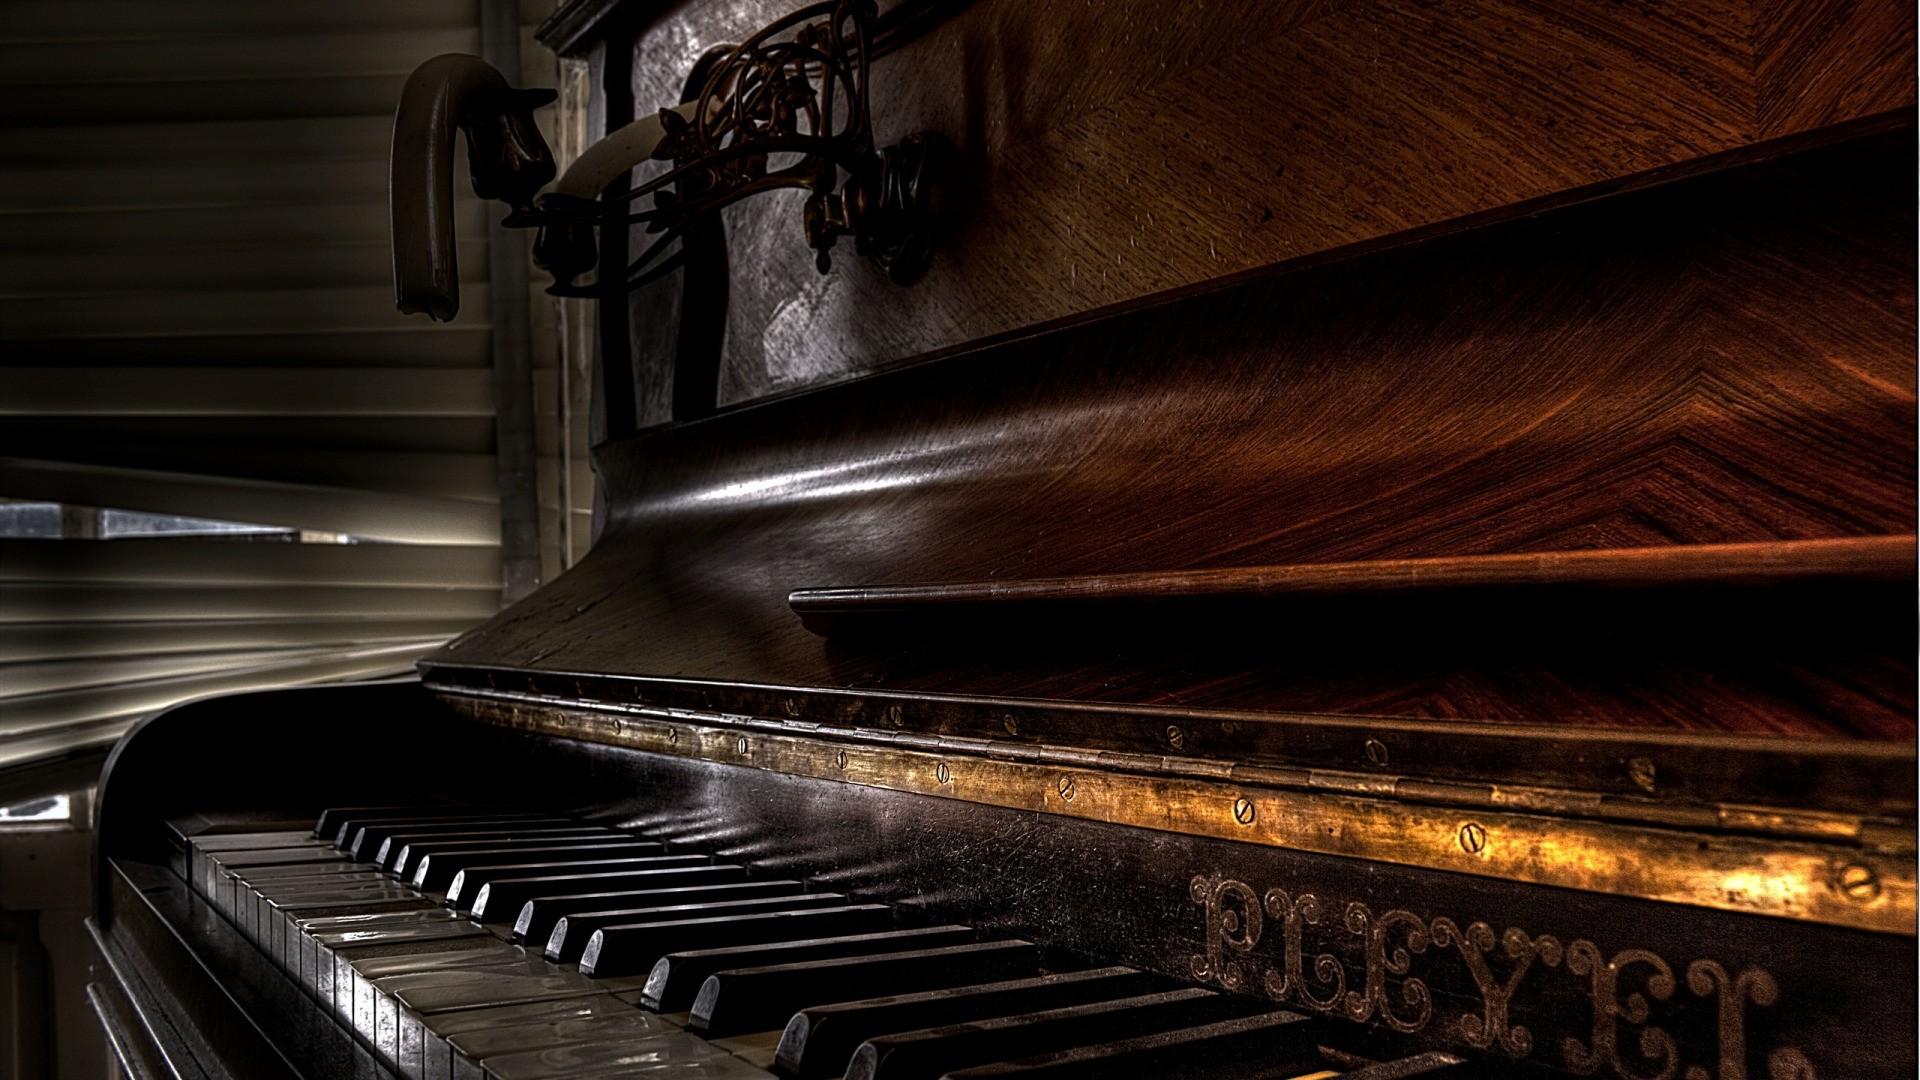 Piano HD Download